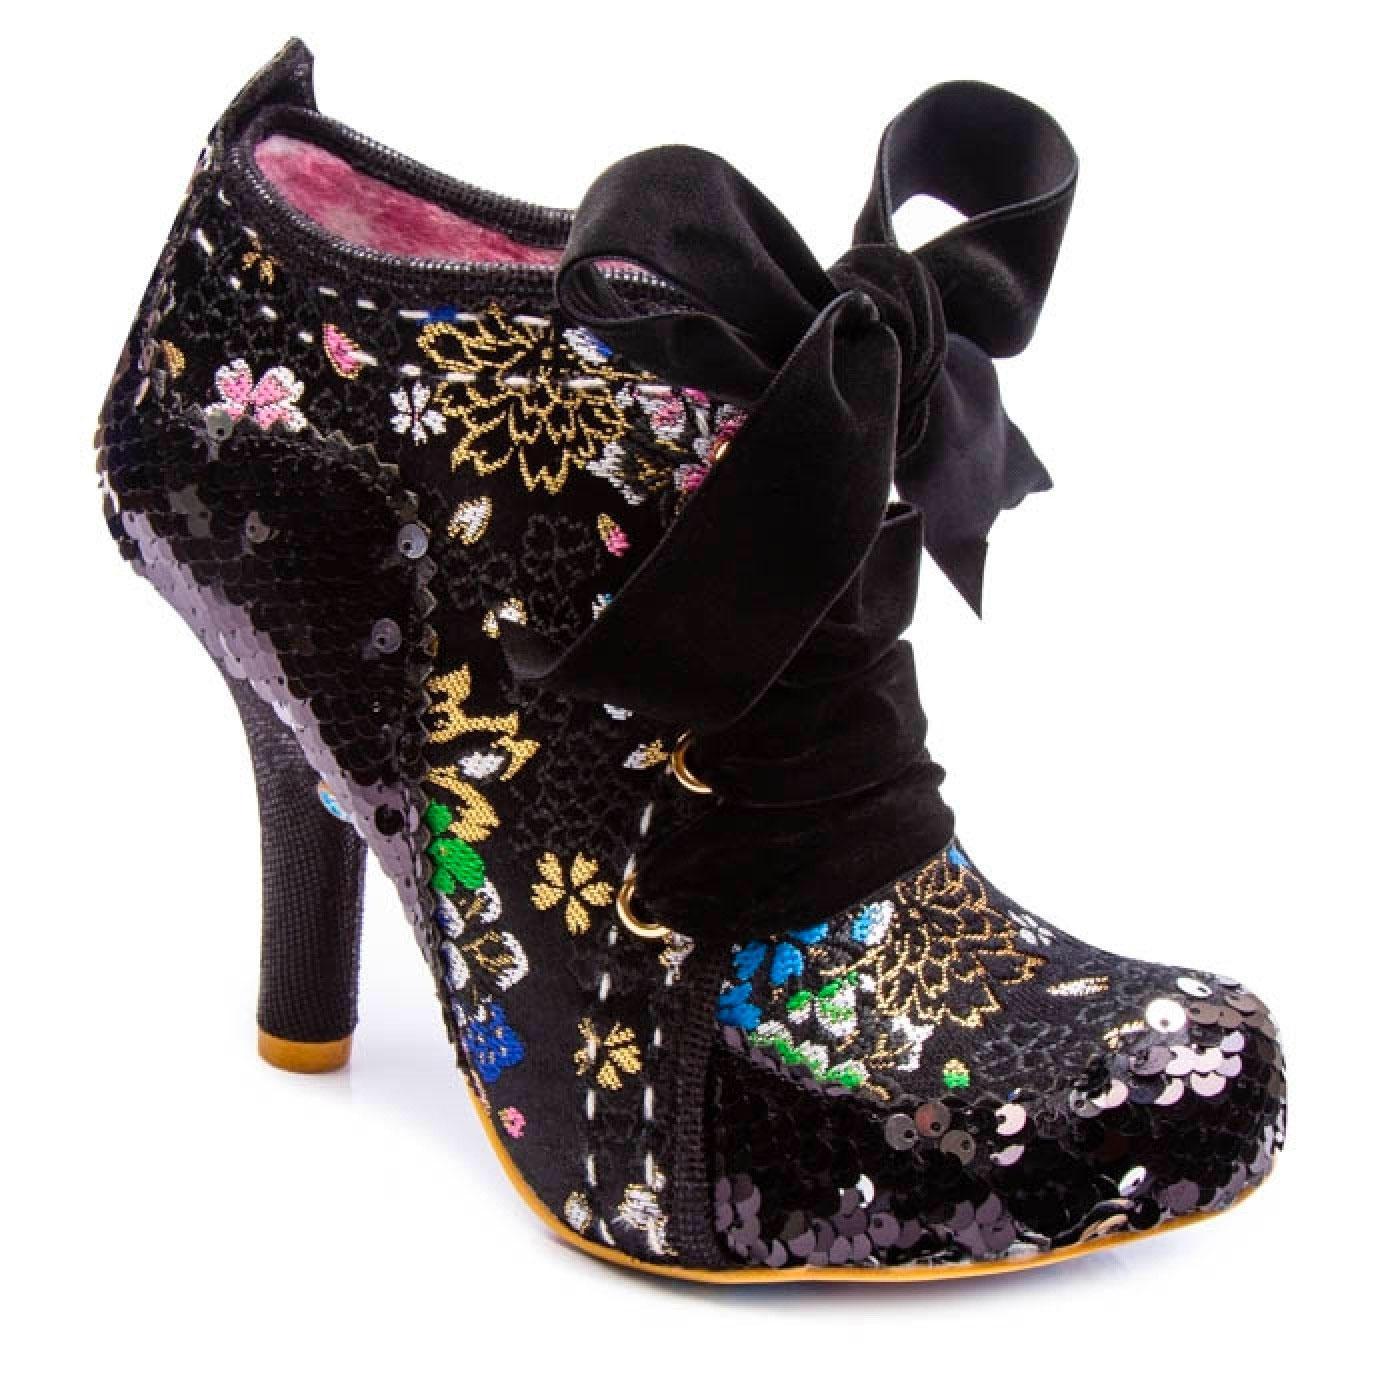 Abigails Third Party IRREGULAR CHOICE Retro Boots